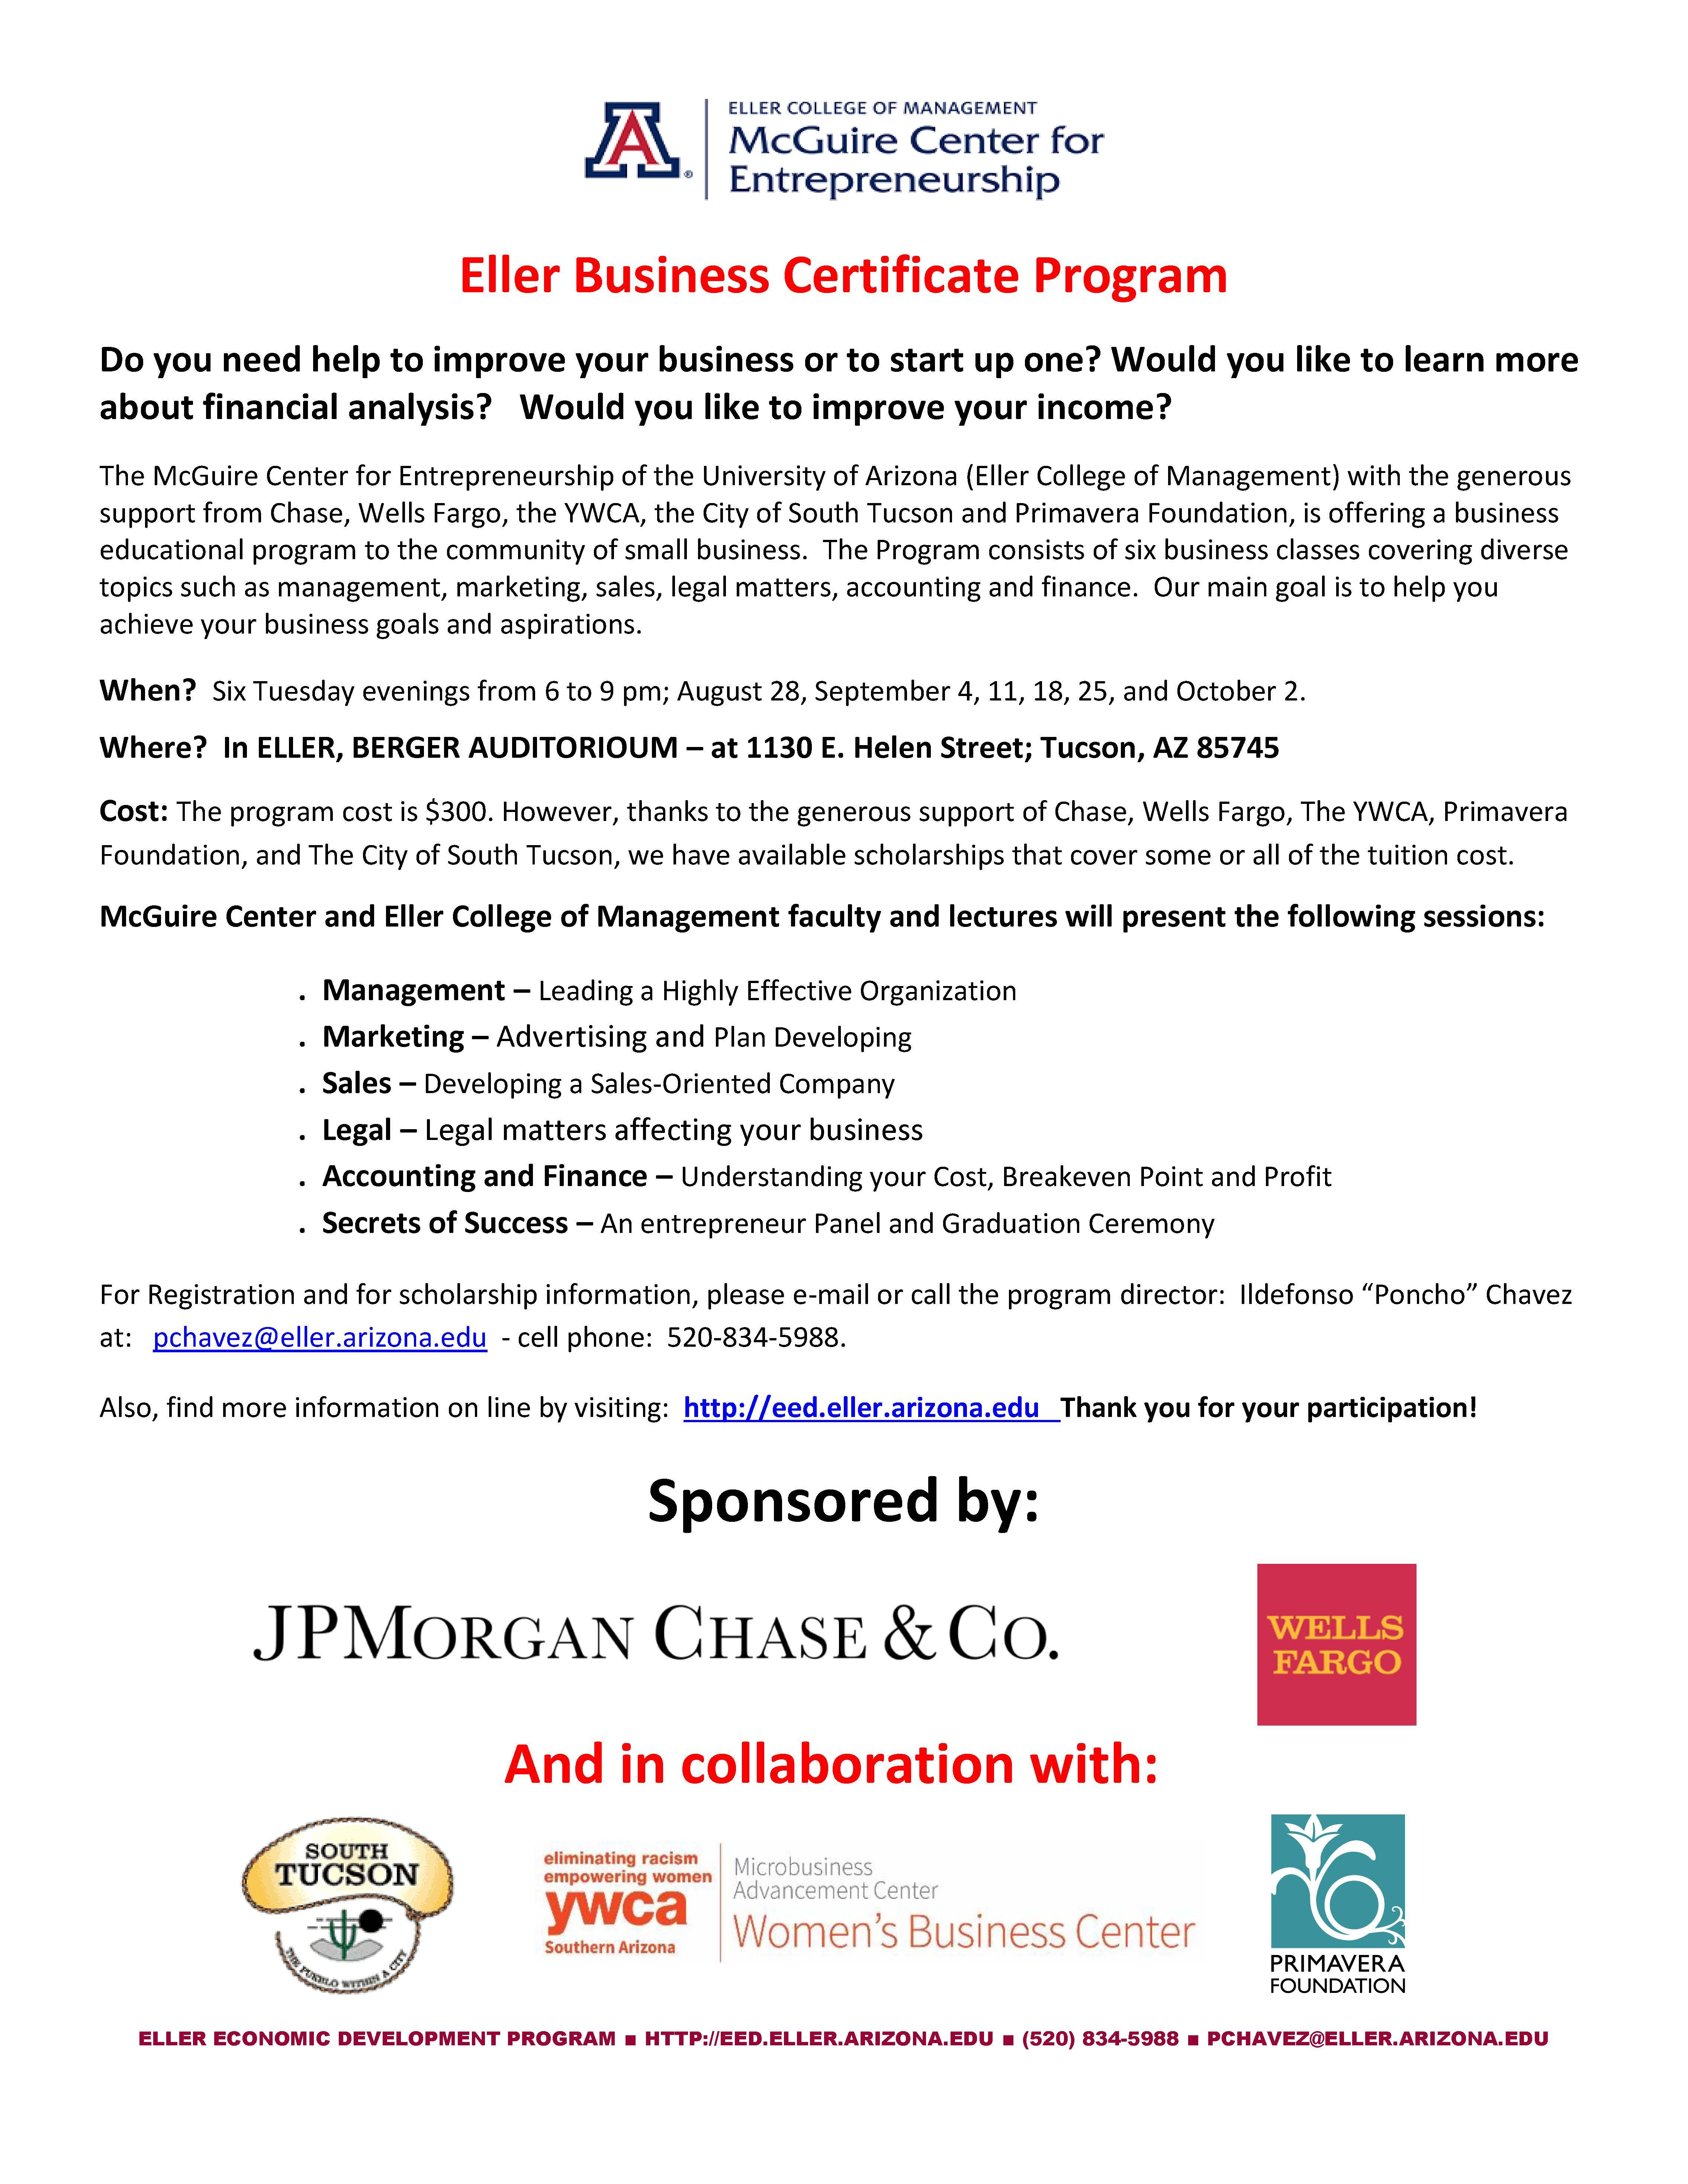 Primavera Supports UA's Eller Business Certificate Program